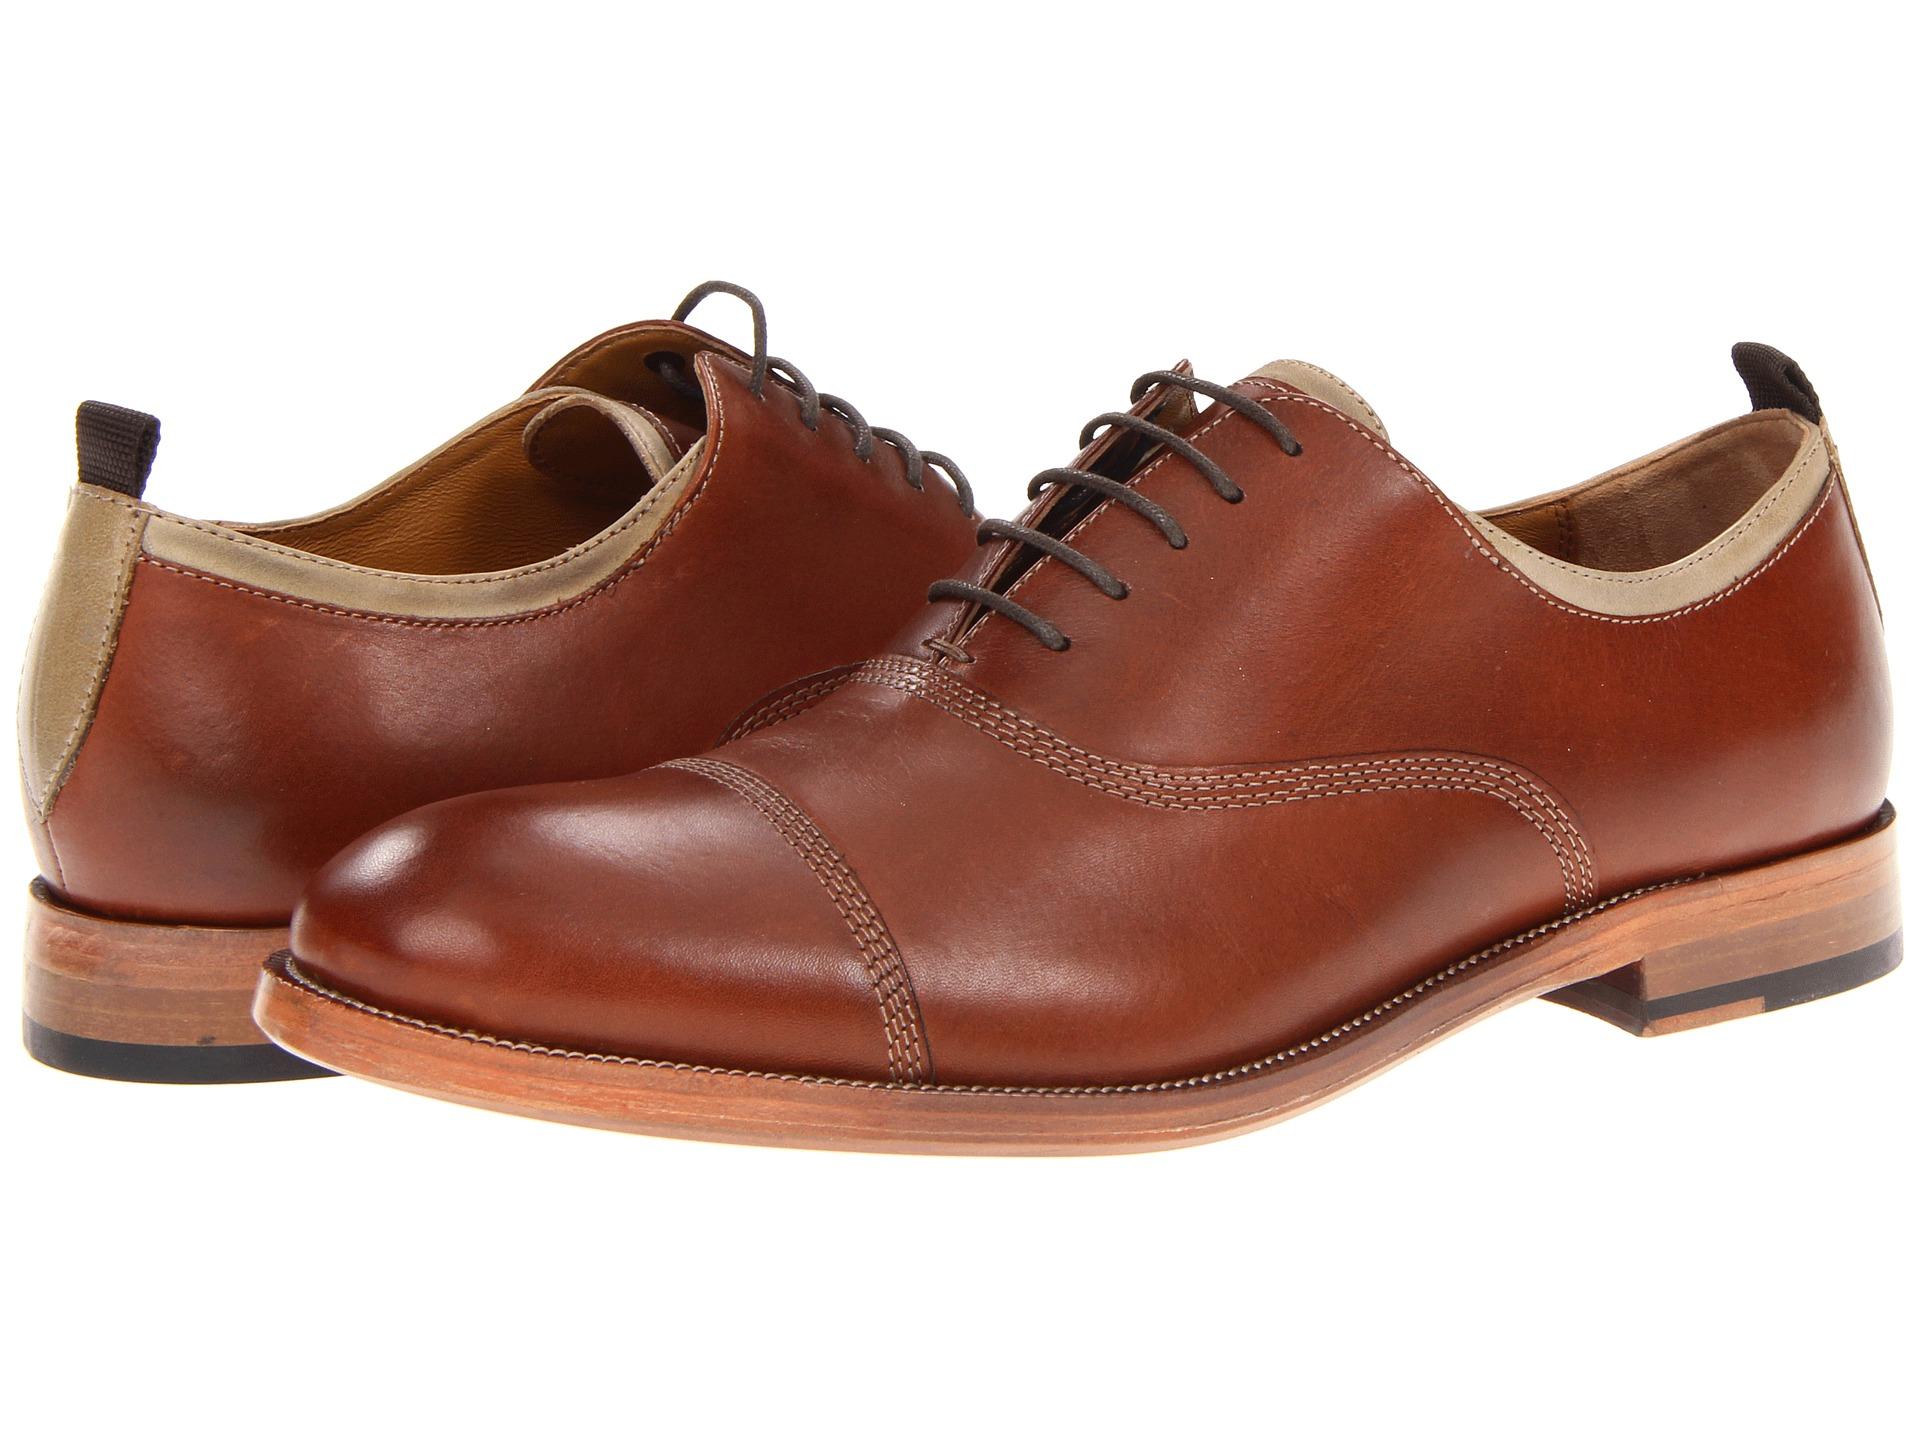 Johnston Murphy Clayton Cap Toe Shoes Shipped Free At